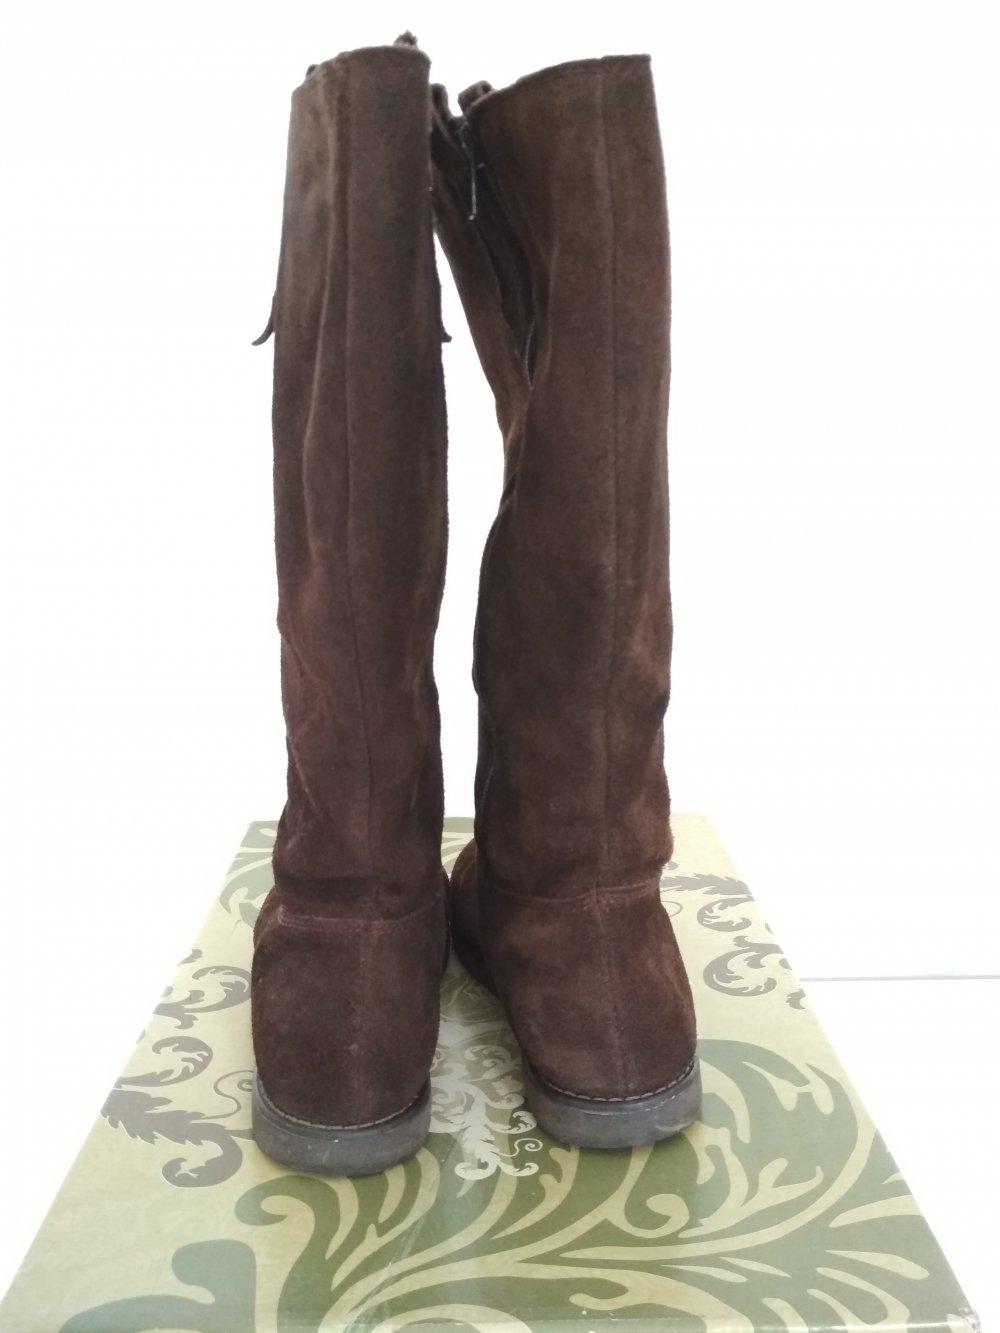 Limelight Stiefel Gr. 38 braun Rauleder Boots